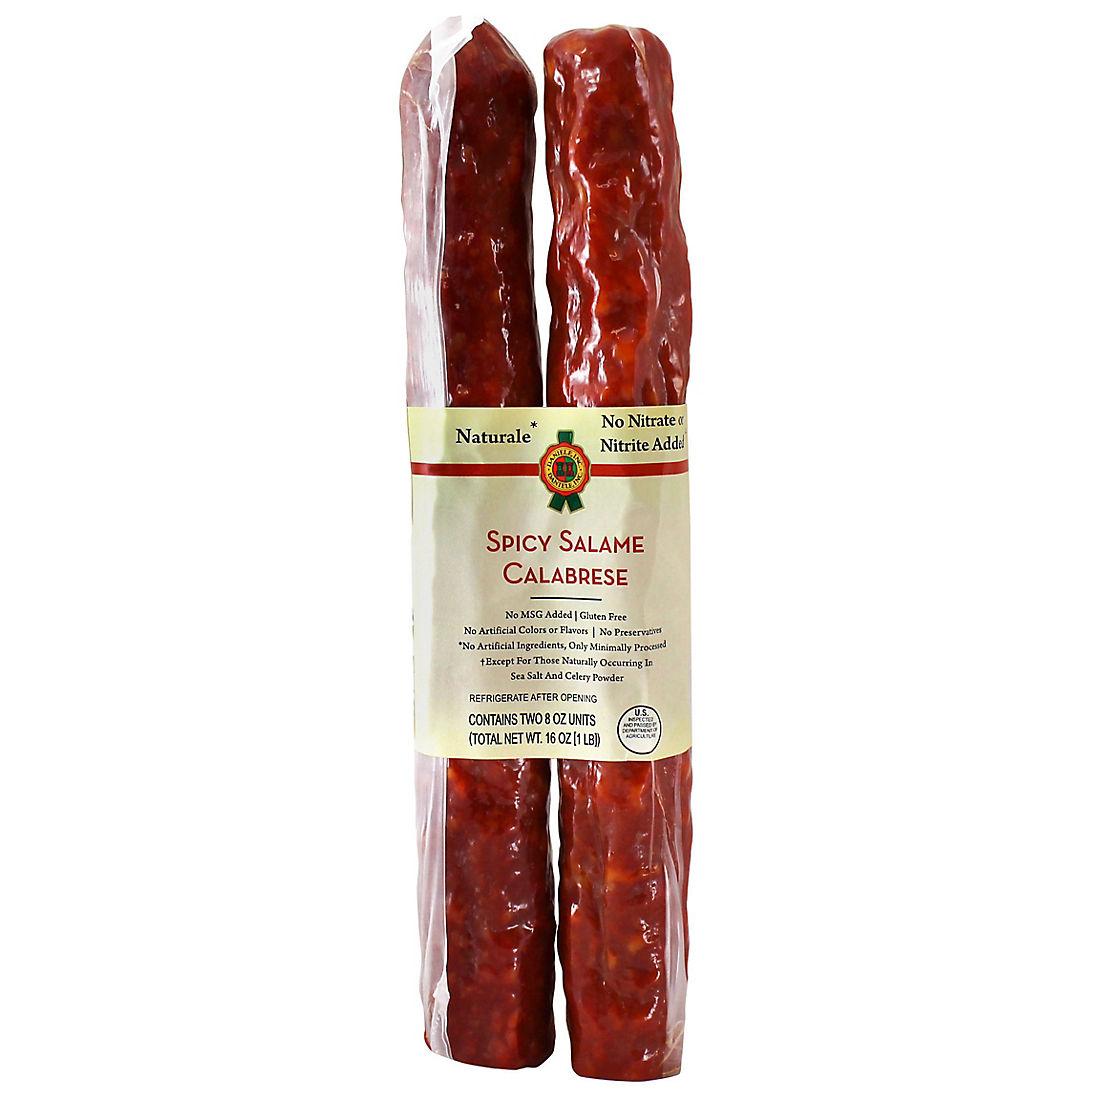 Daniele Spicy Salame Calabrese Sticks, 2 pk /8 oz